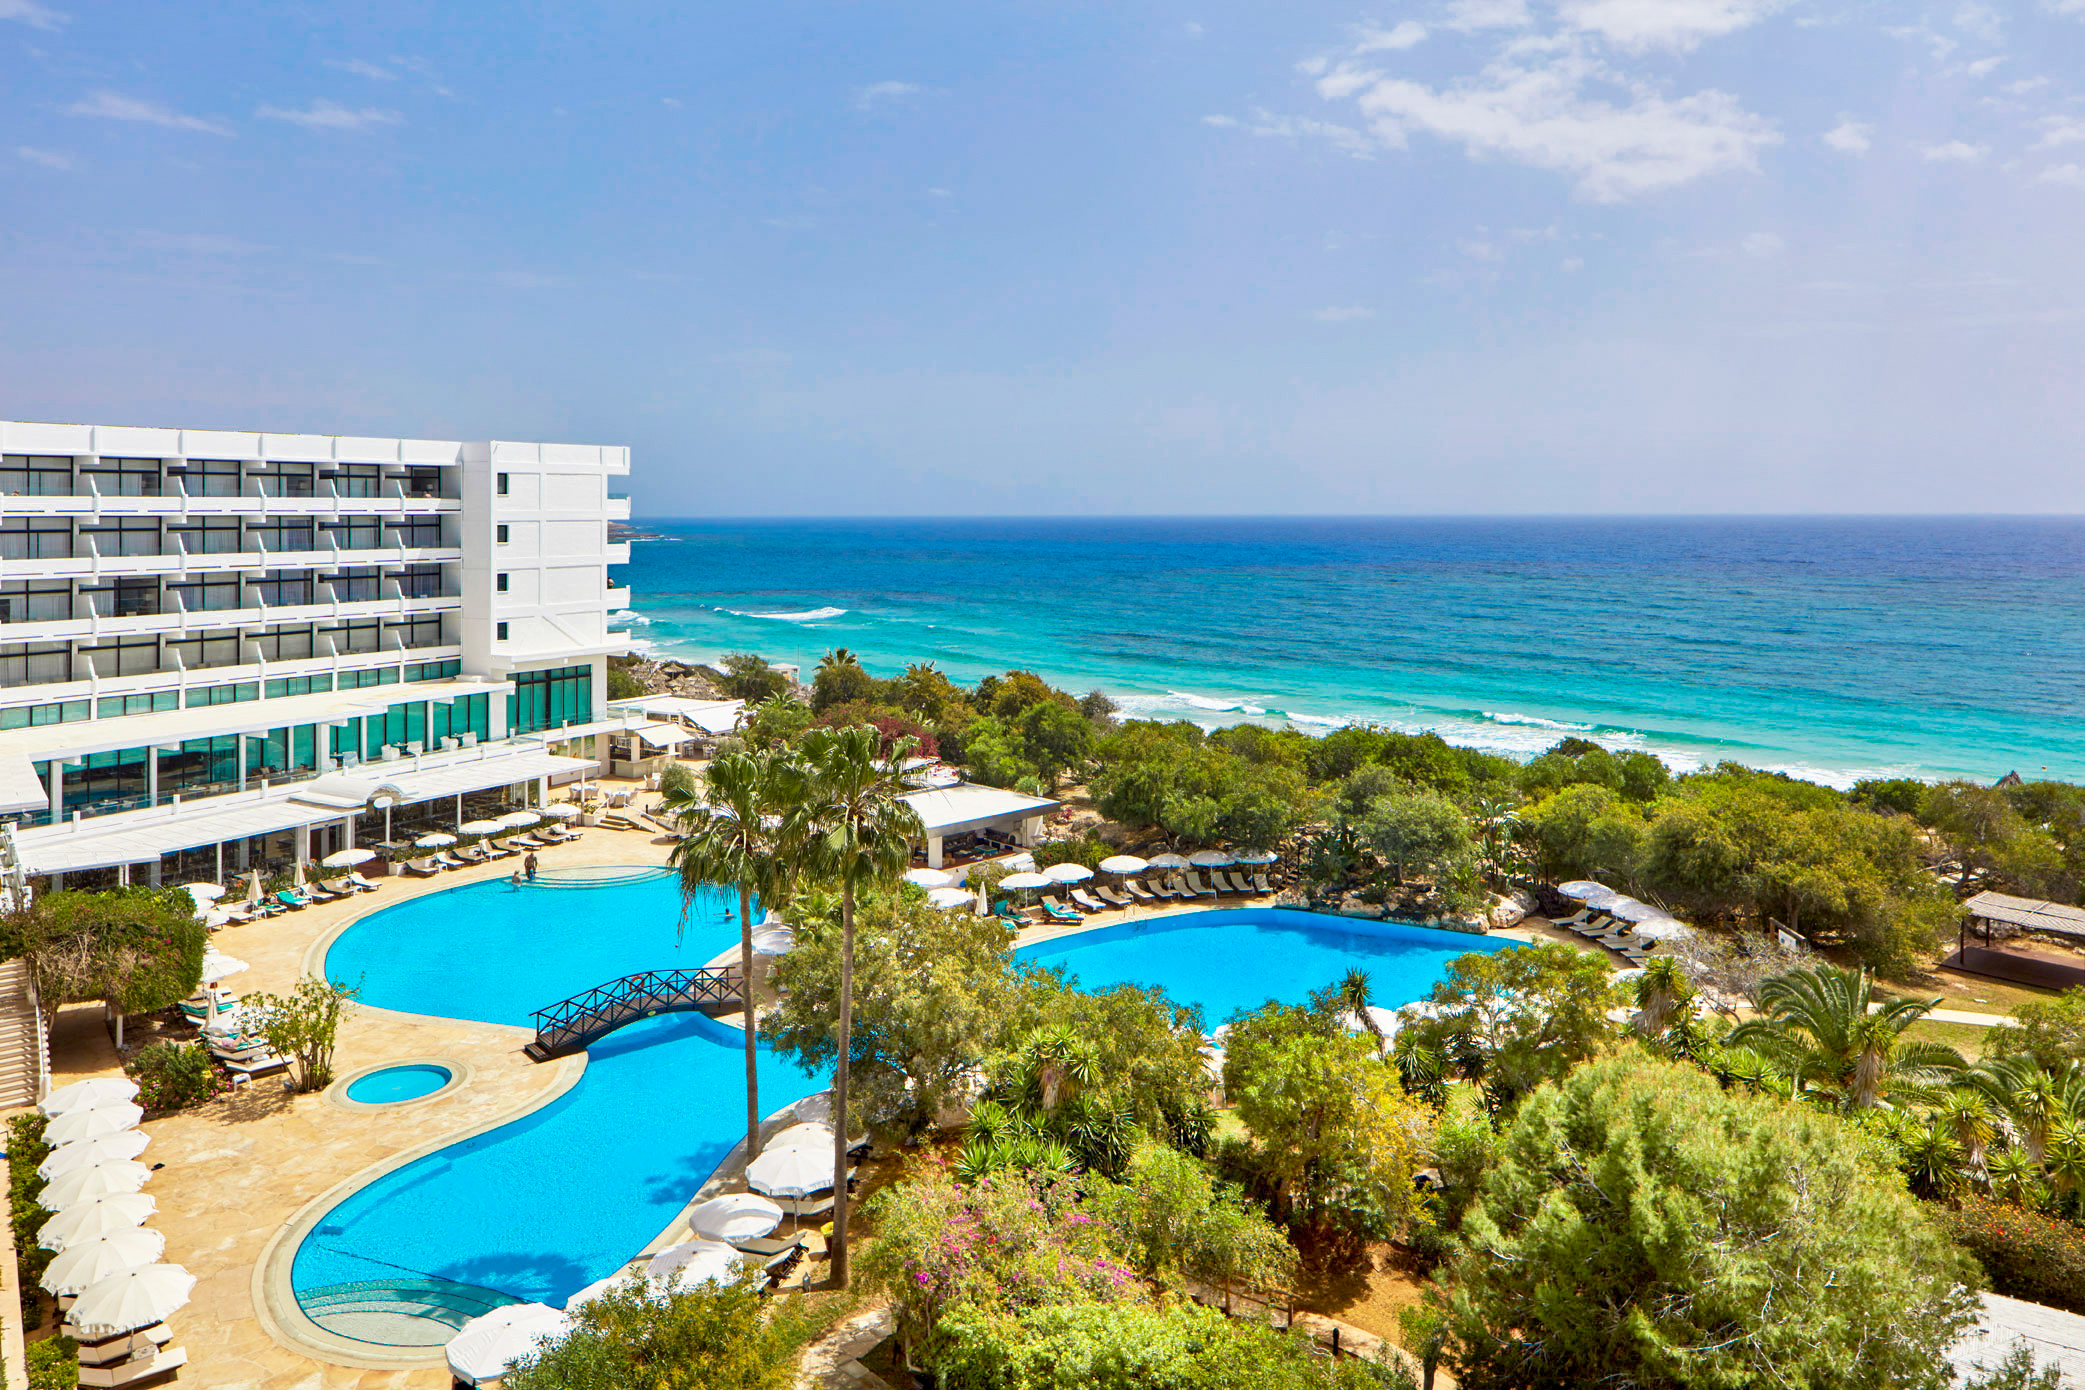 Grecian Bay Hotel Zypern Bewertung